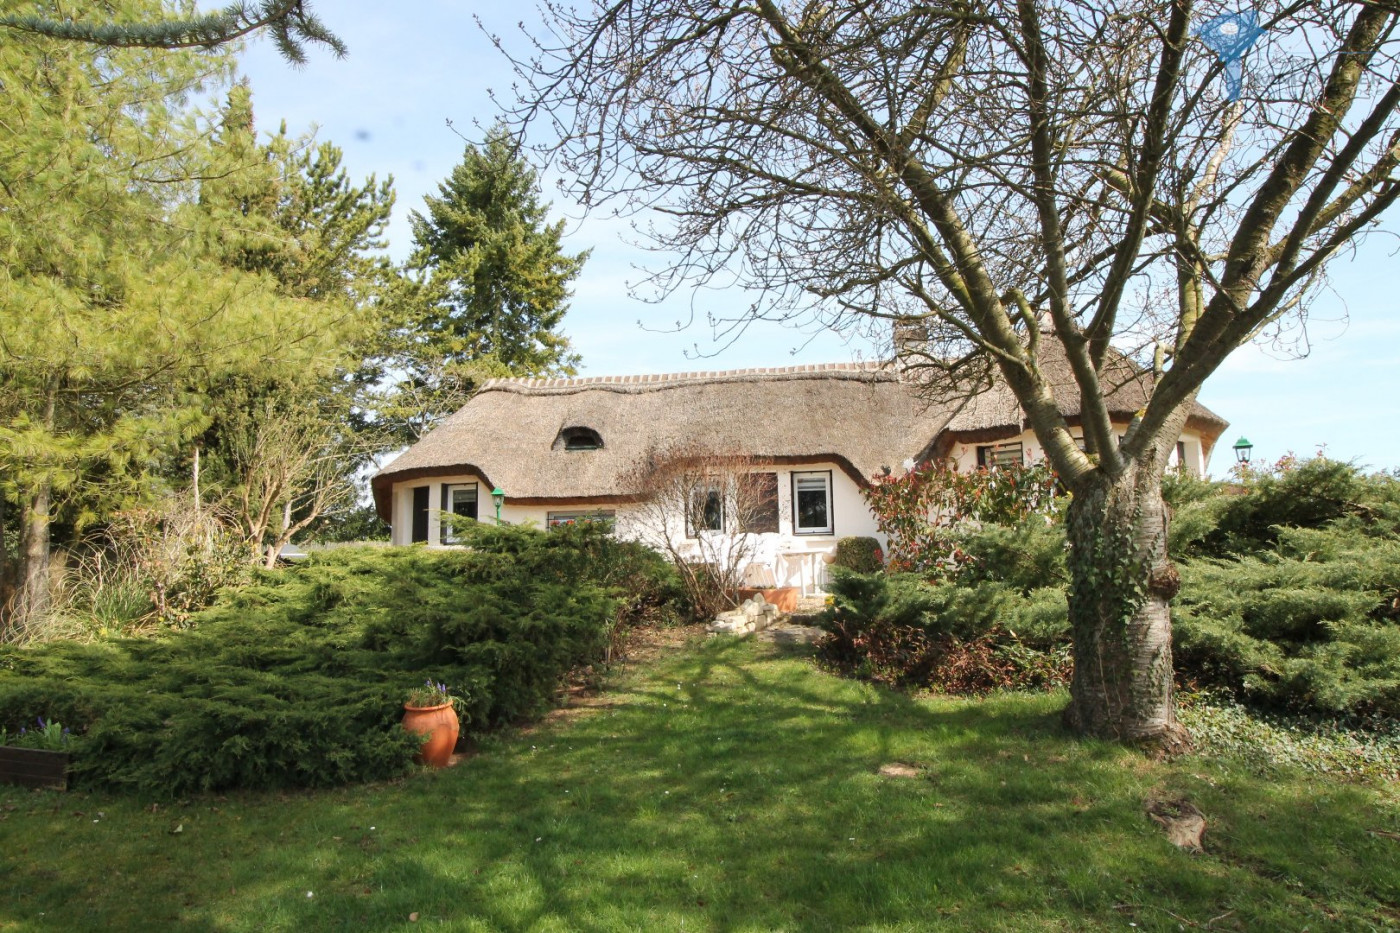 A vendre Breval 3438032619 Comptoir immobilier en normandie